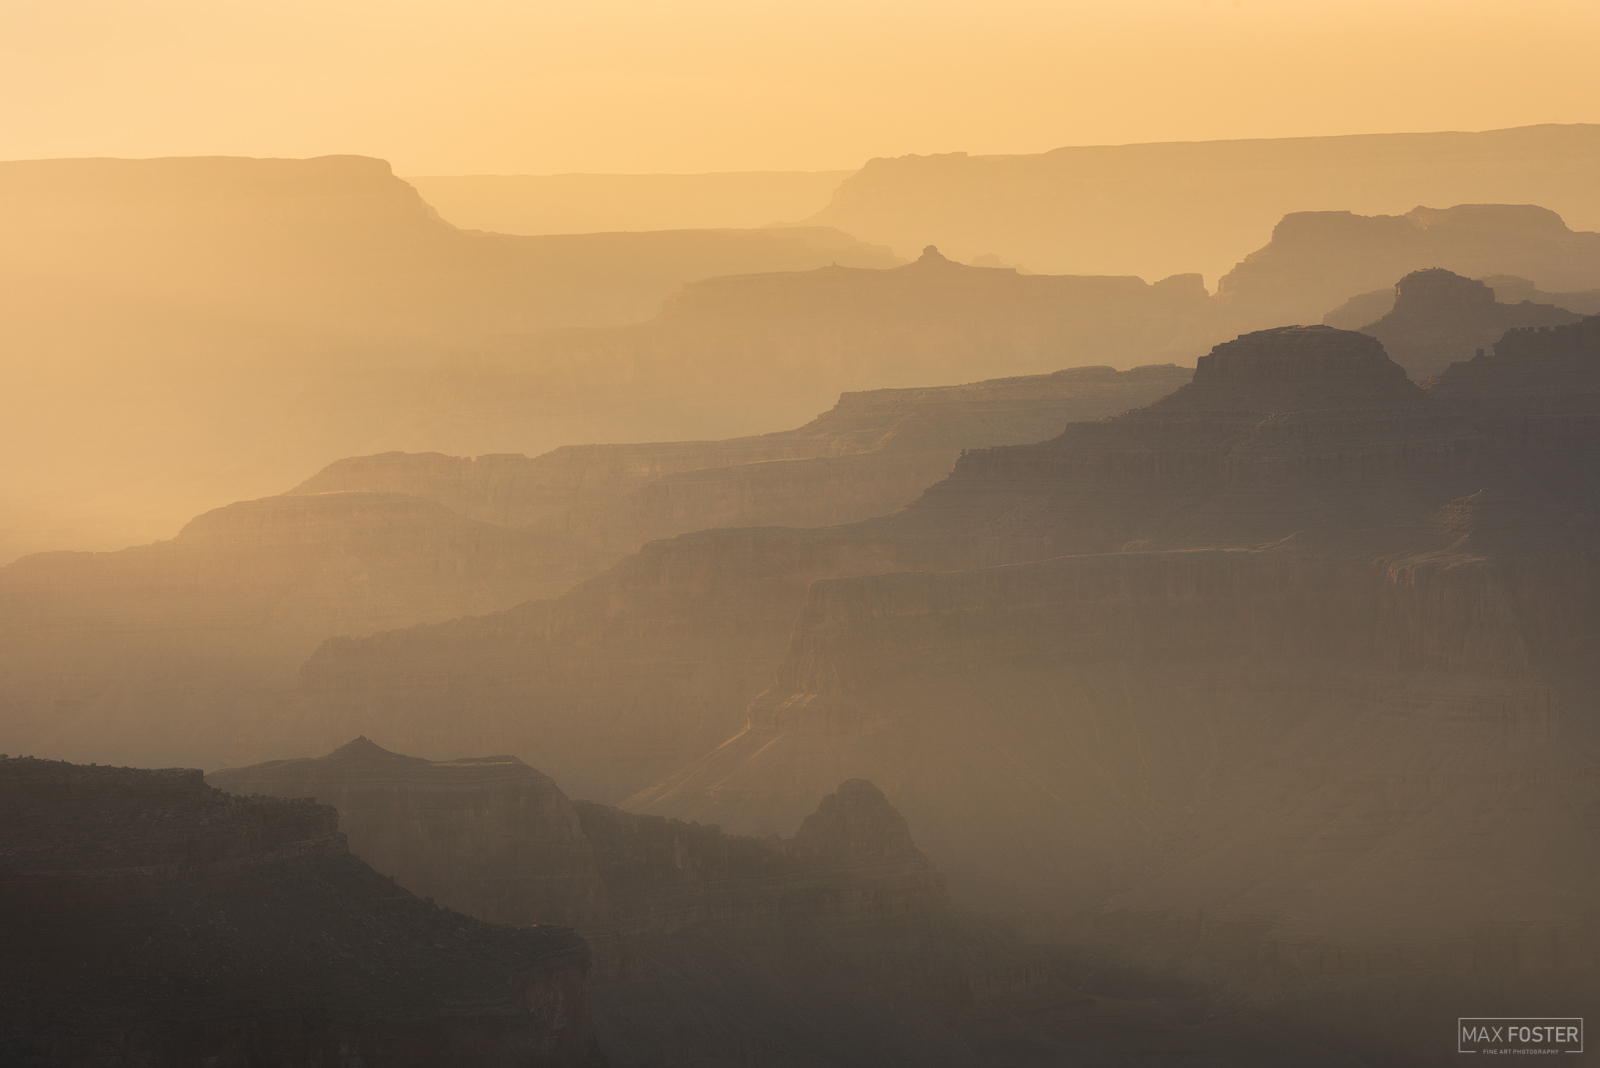 Grand Canyon National Park, Arizona, Southwest Silhouette, photo